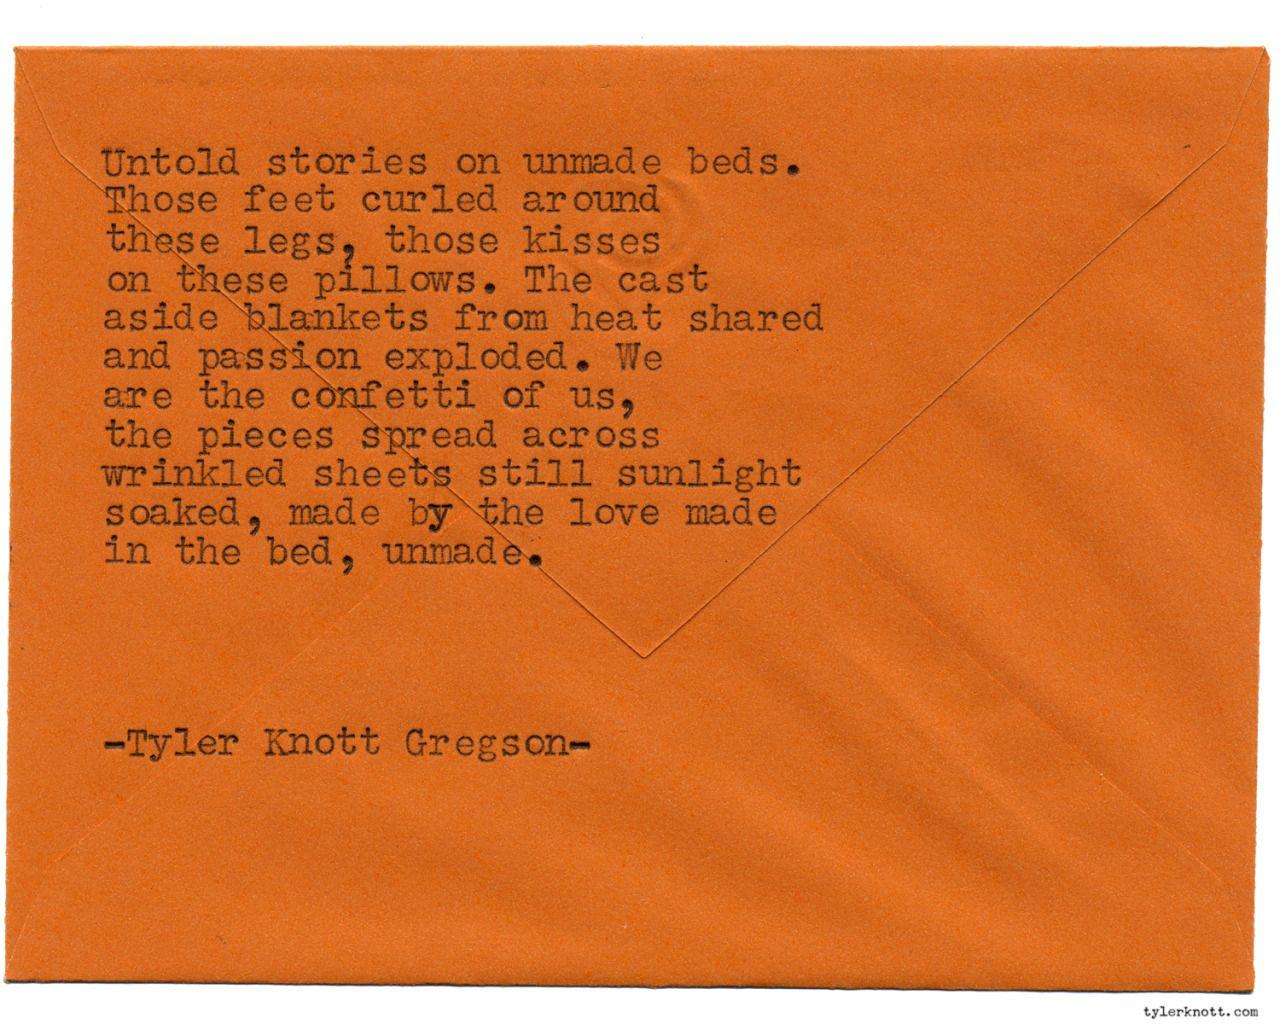 Typewriter Series 1272 By Tyler Knott Gregson Pre Order My New